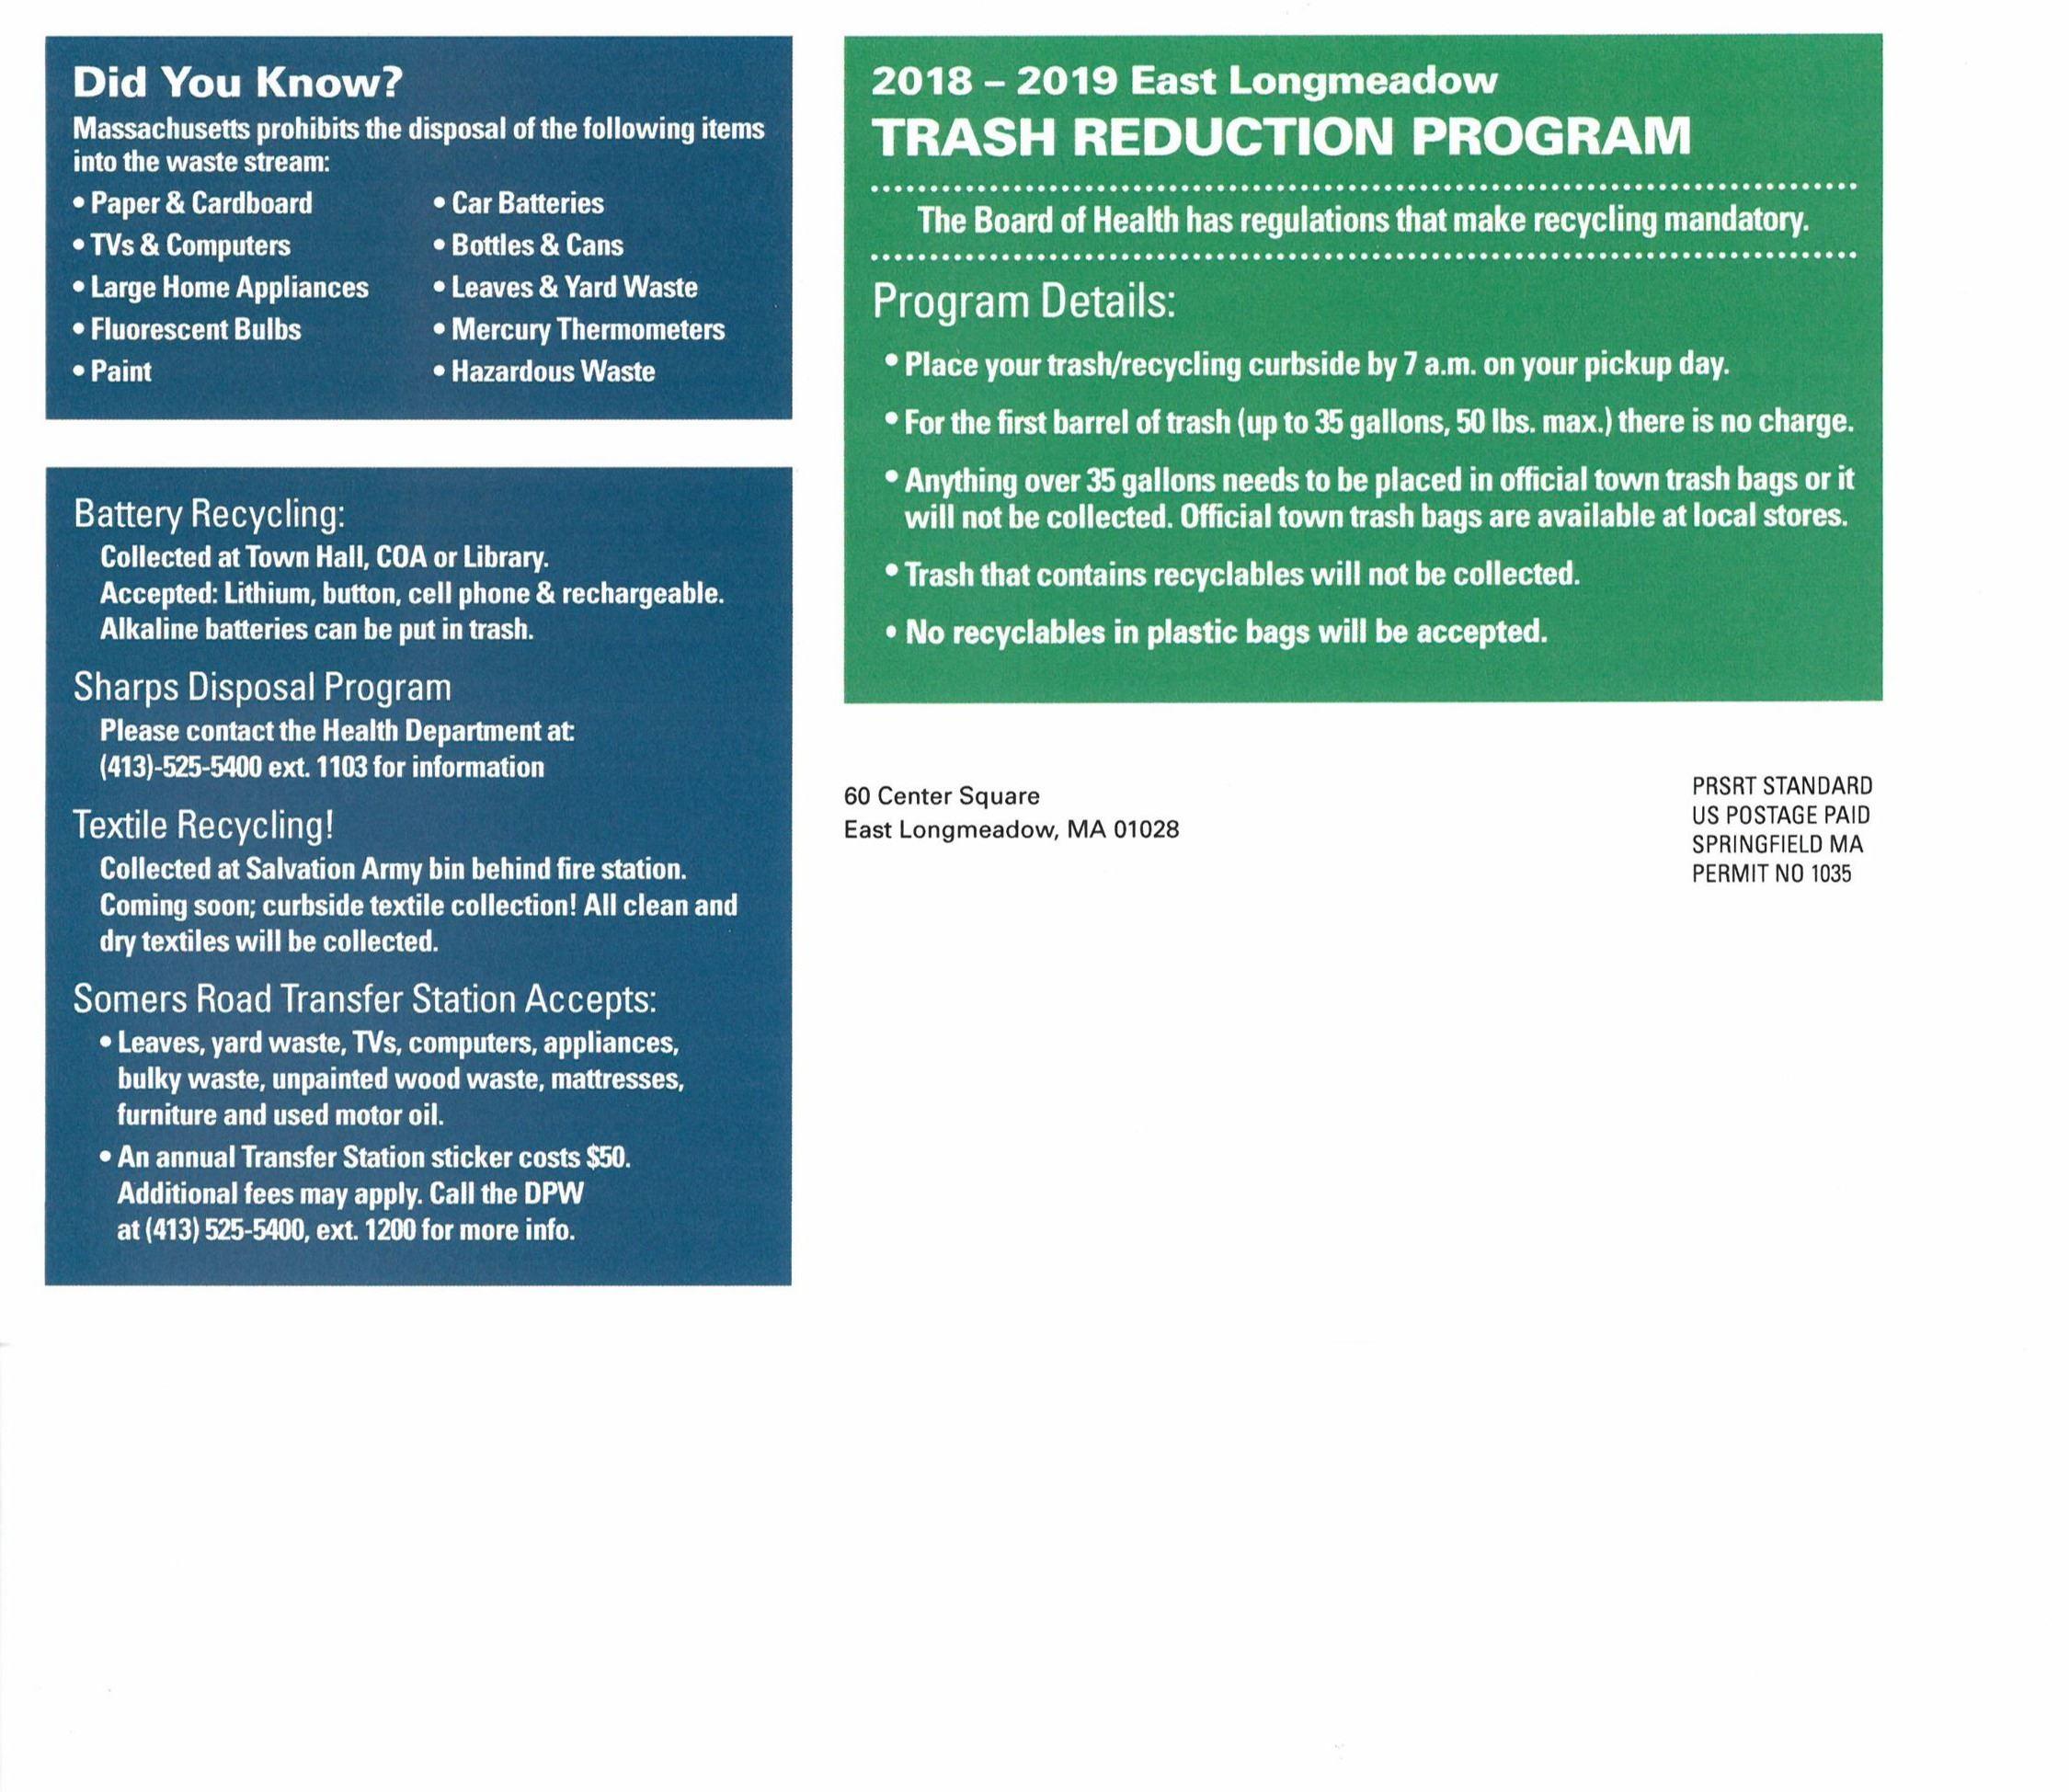 Mass Pay Info Site: East Longmeadow, MA - Official Website